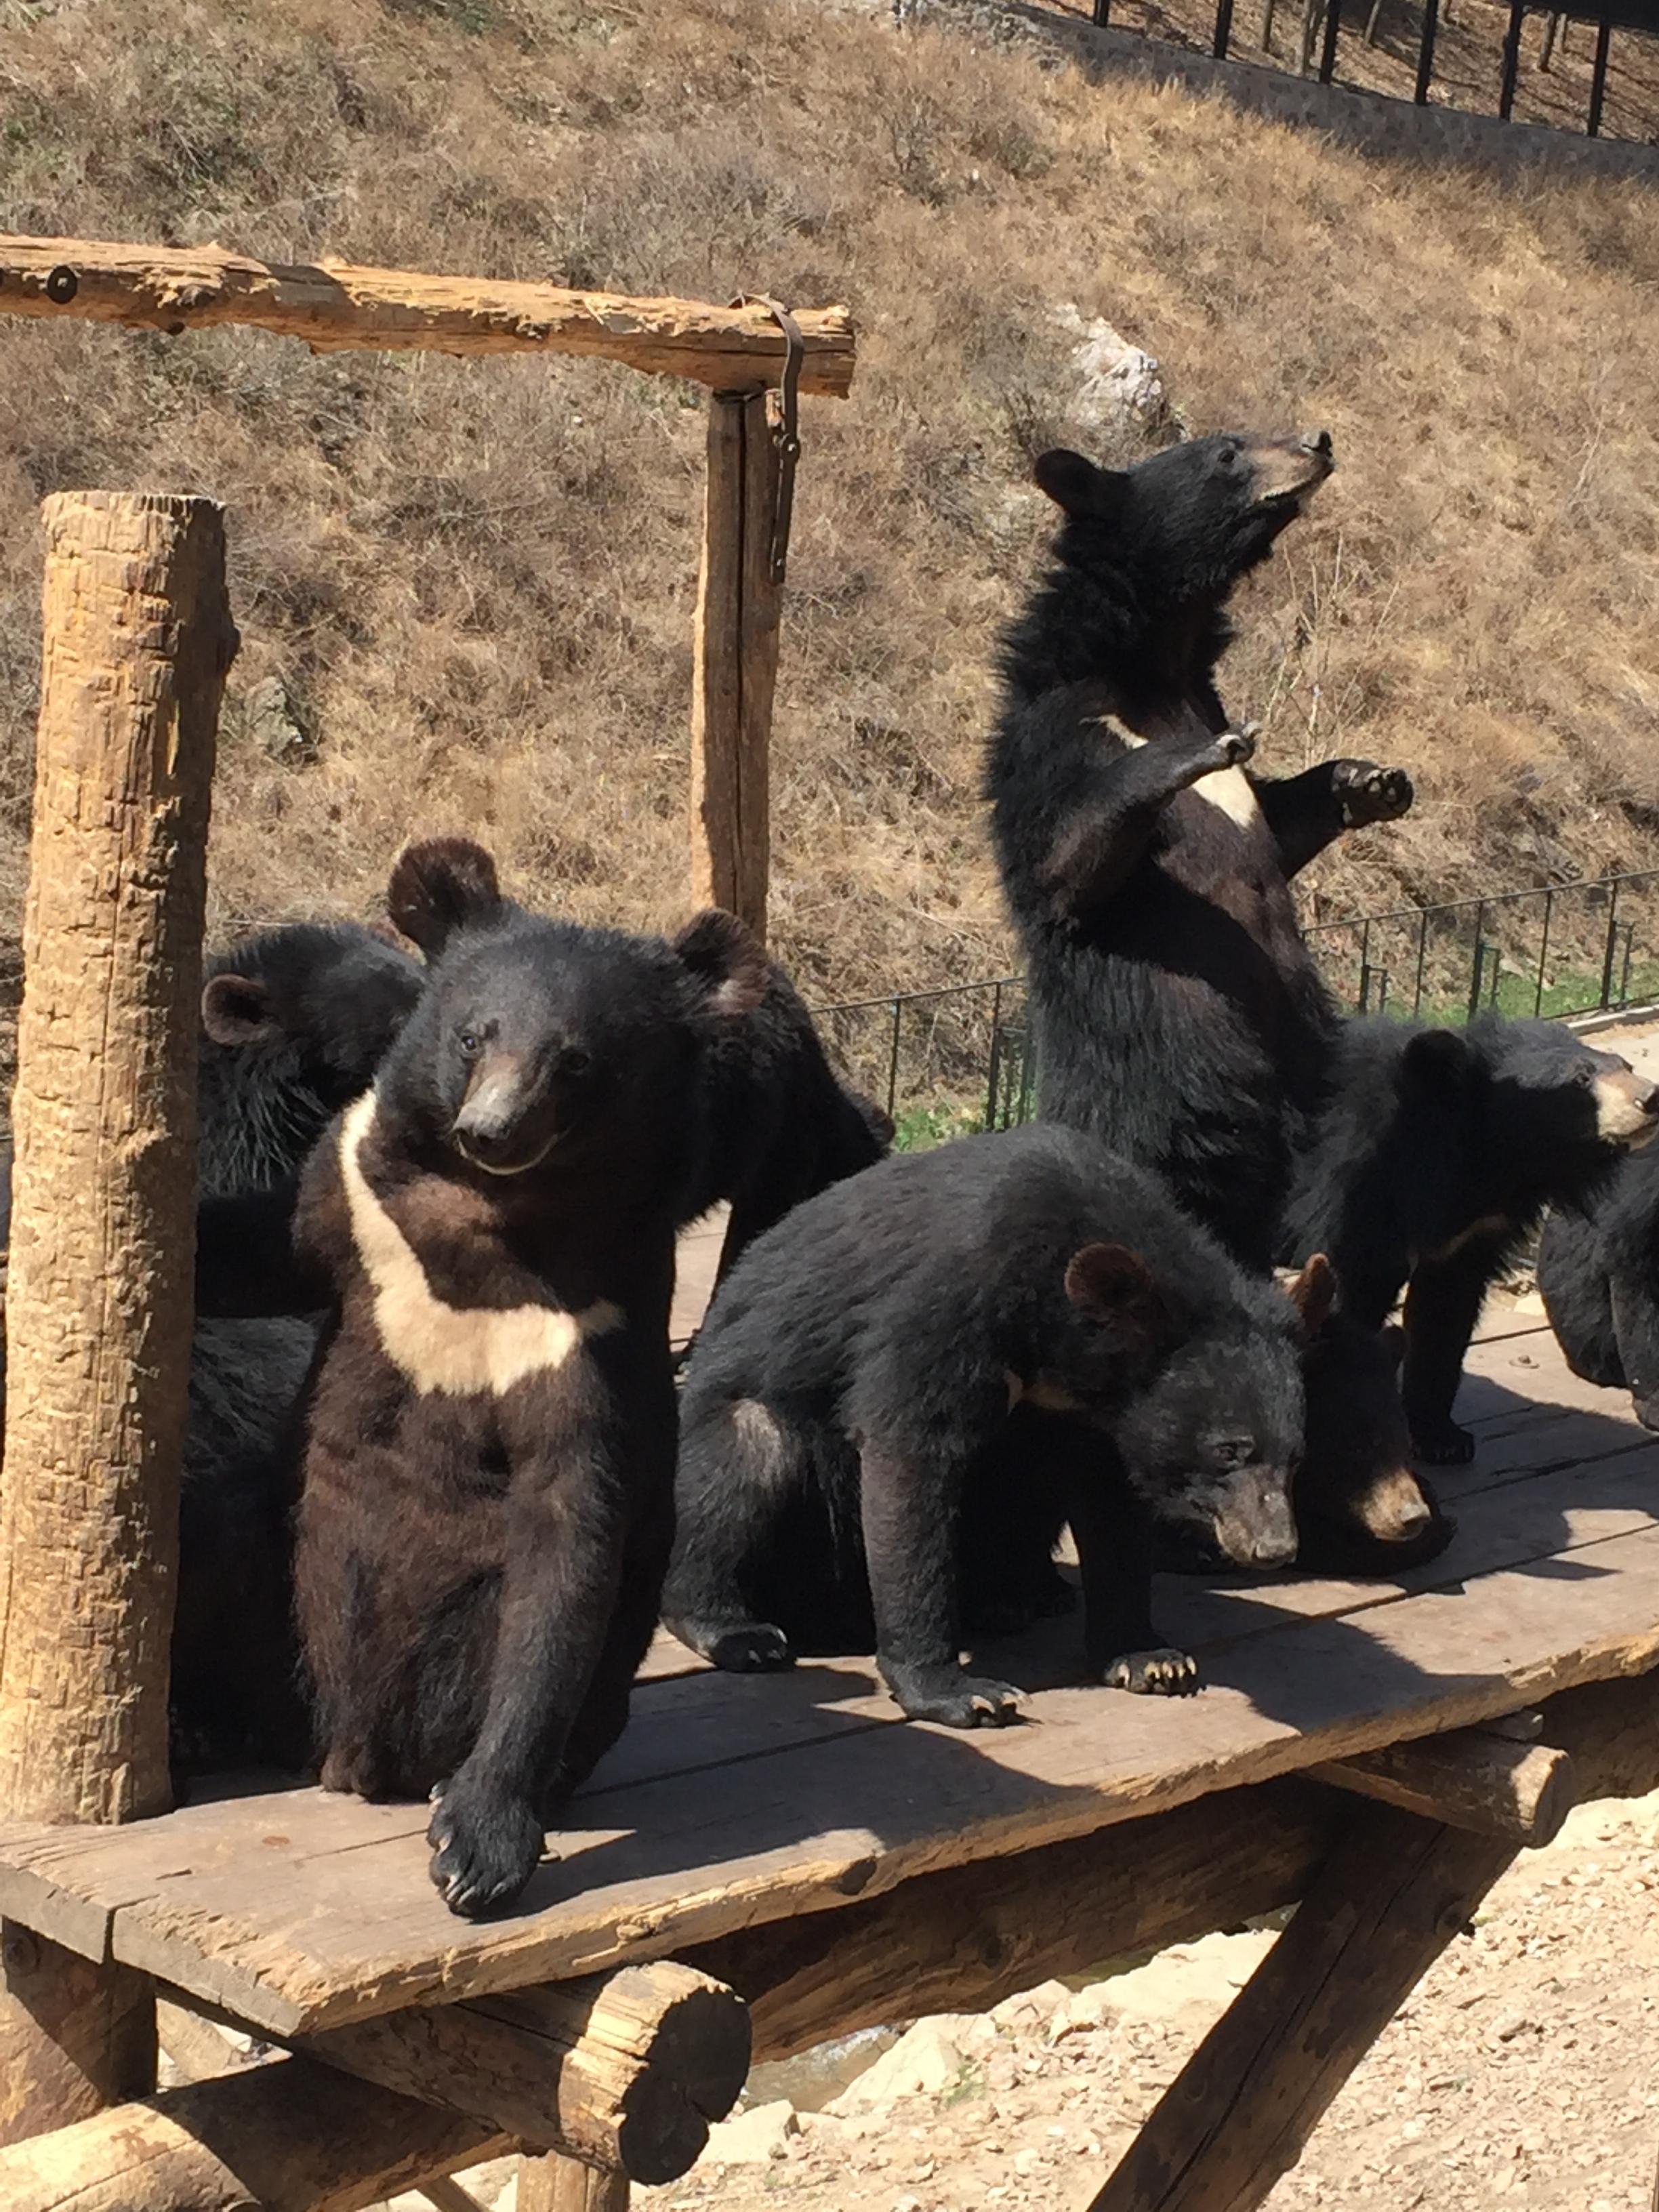 The bear literally danced.